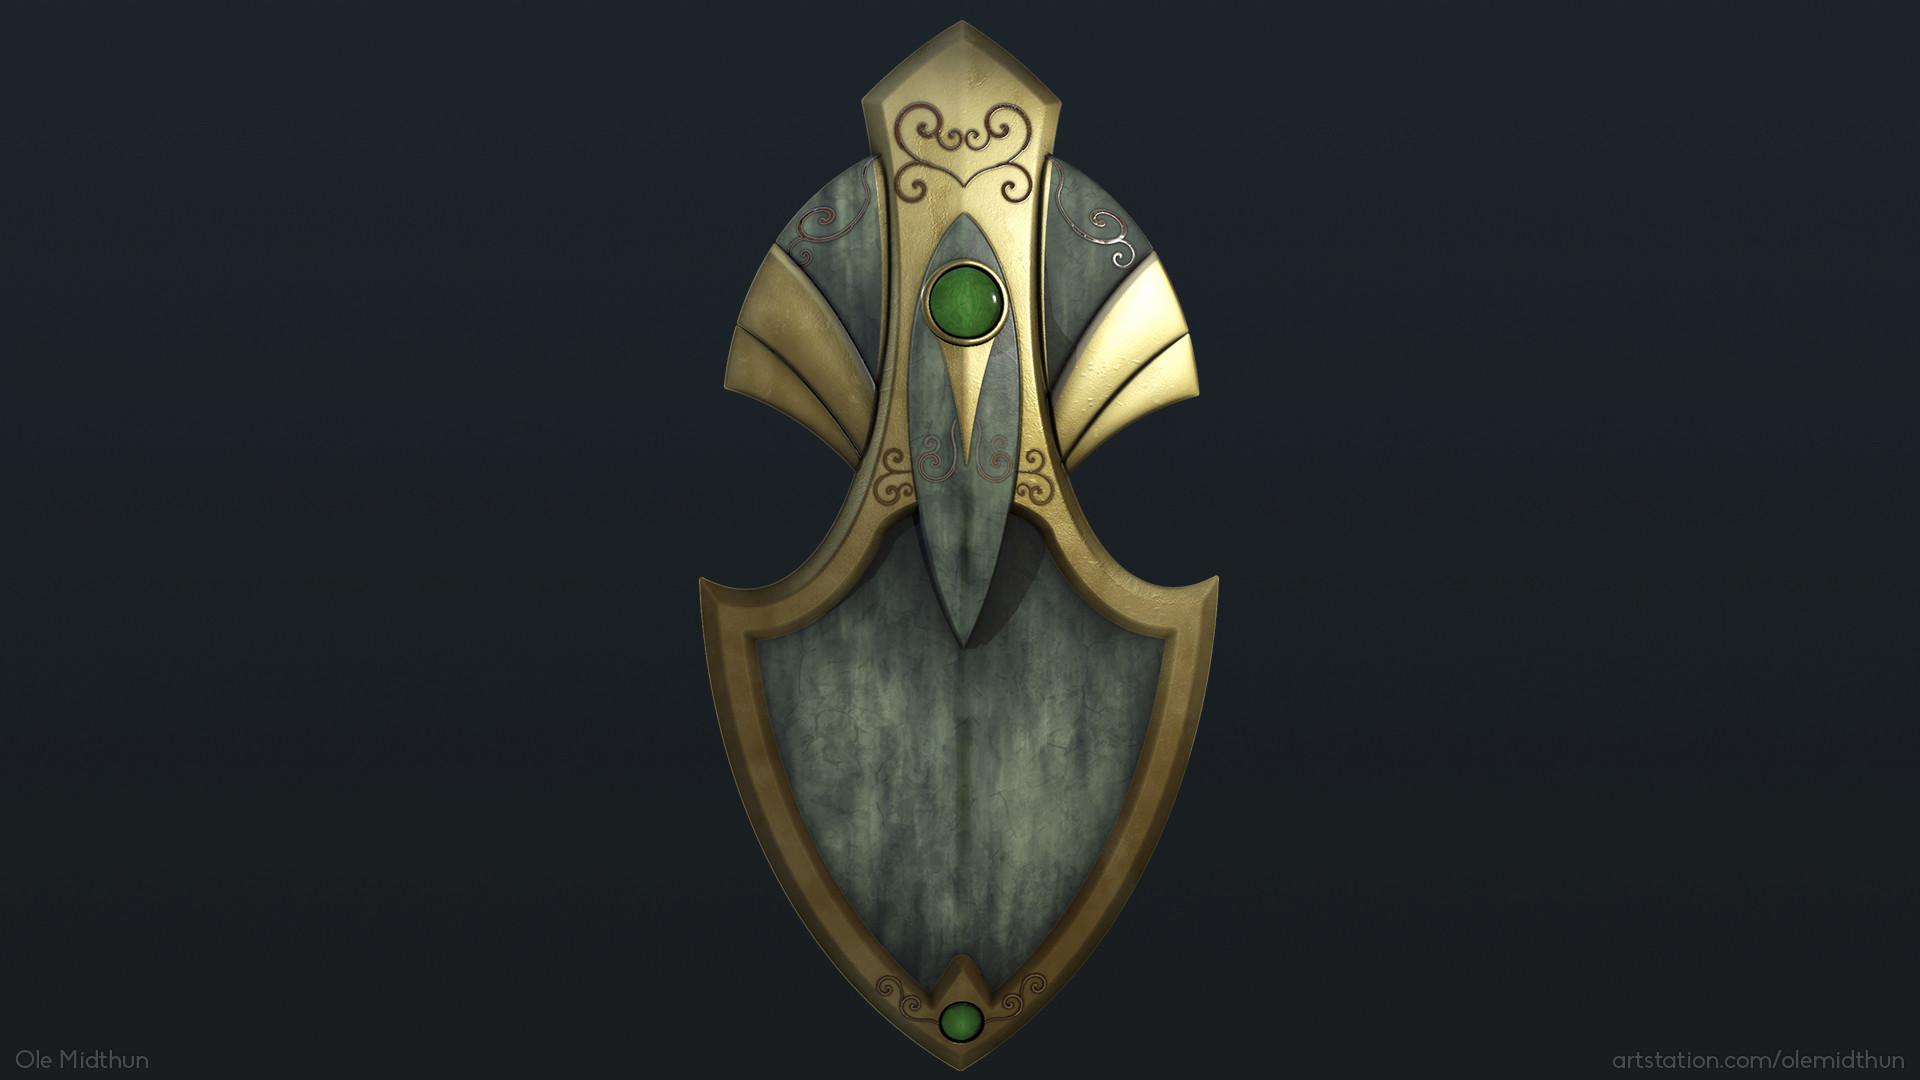 Ole midthun elven shield 1